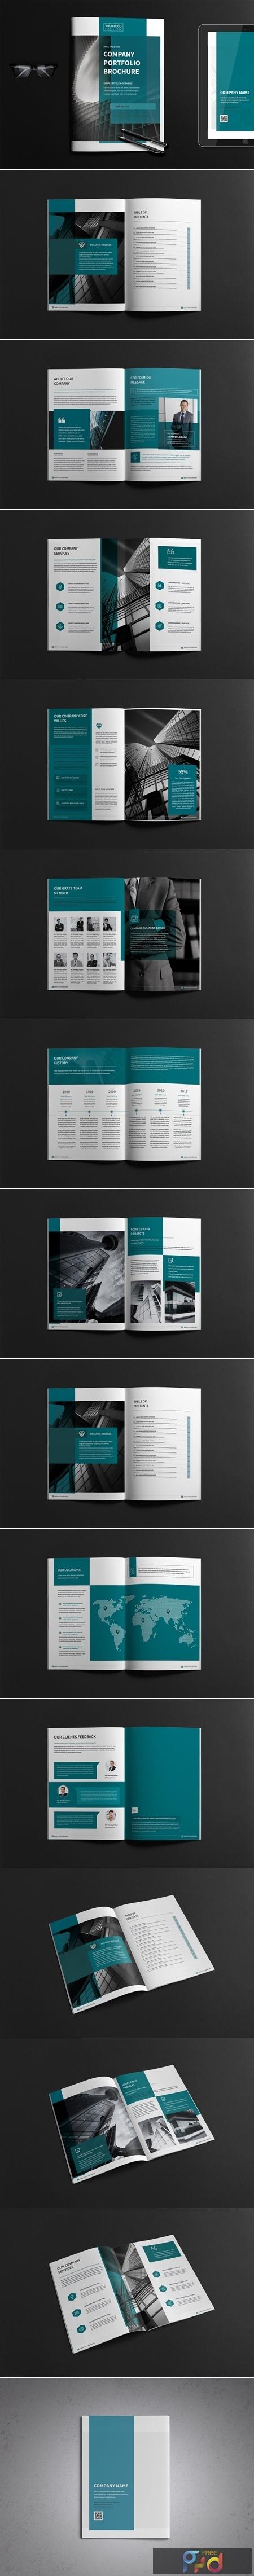 Business Company Portfolio Brochure 4159084 1